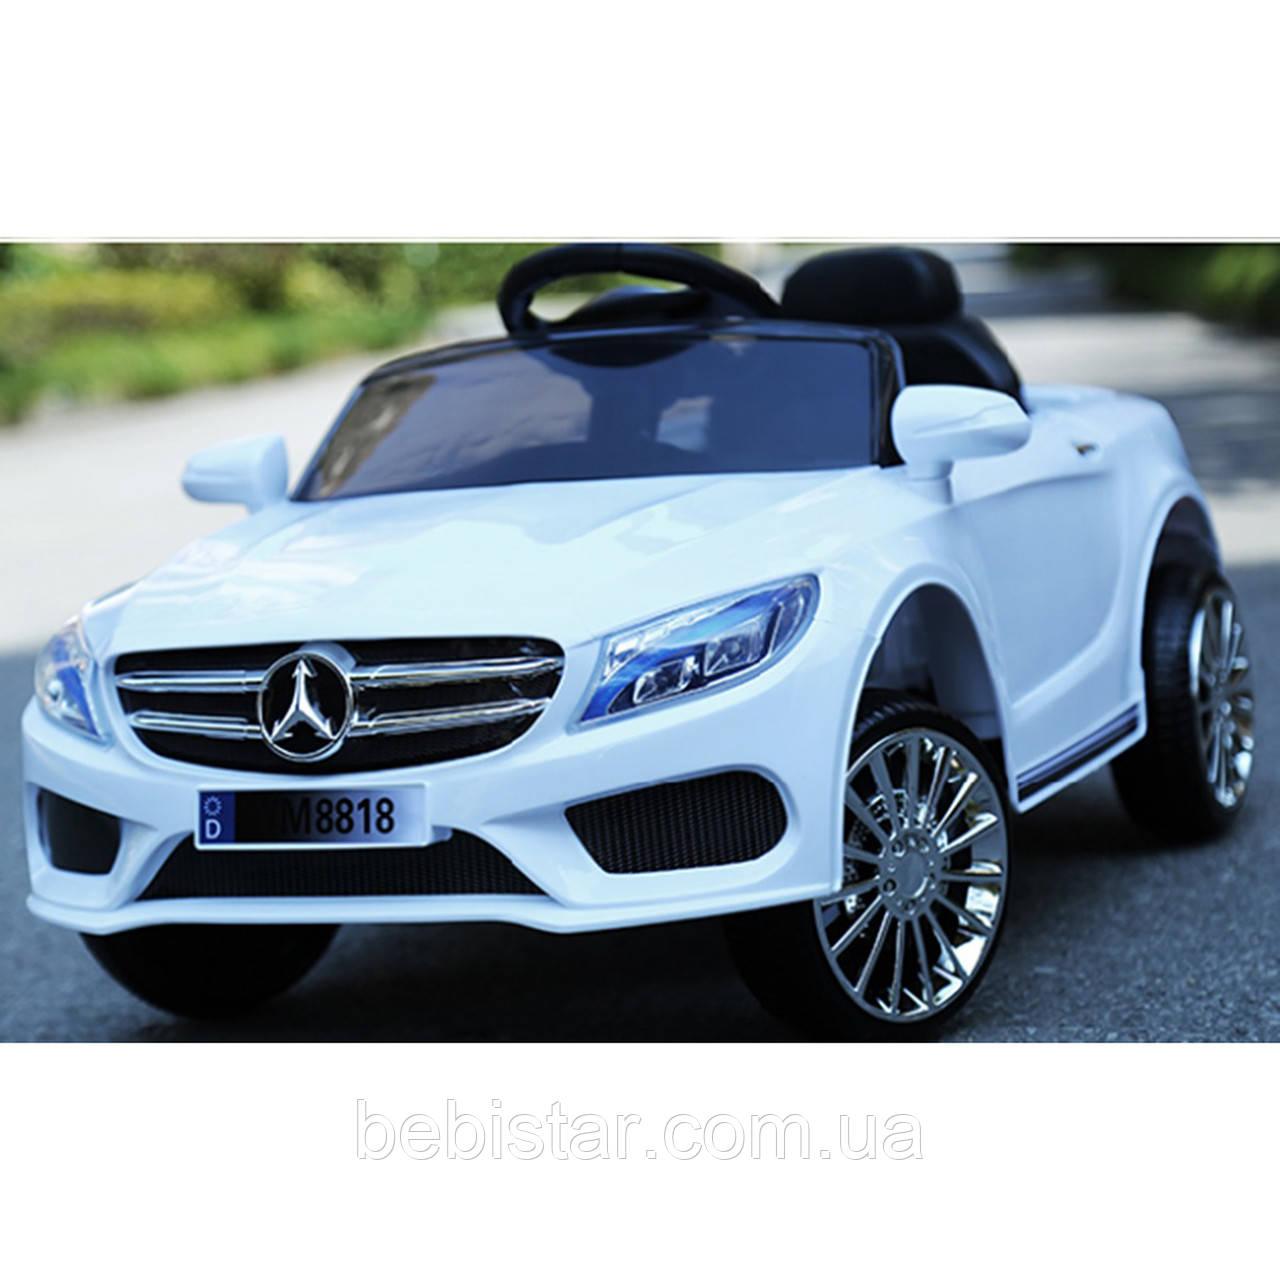 Электромобиль-спорткар белый T-7620 White для деток 3-8 лет с MP3